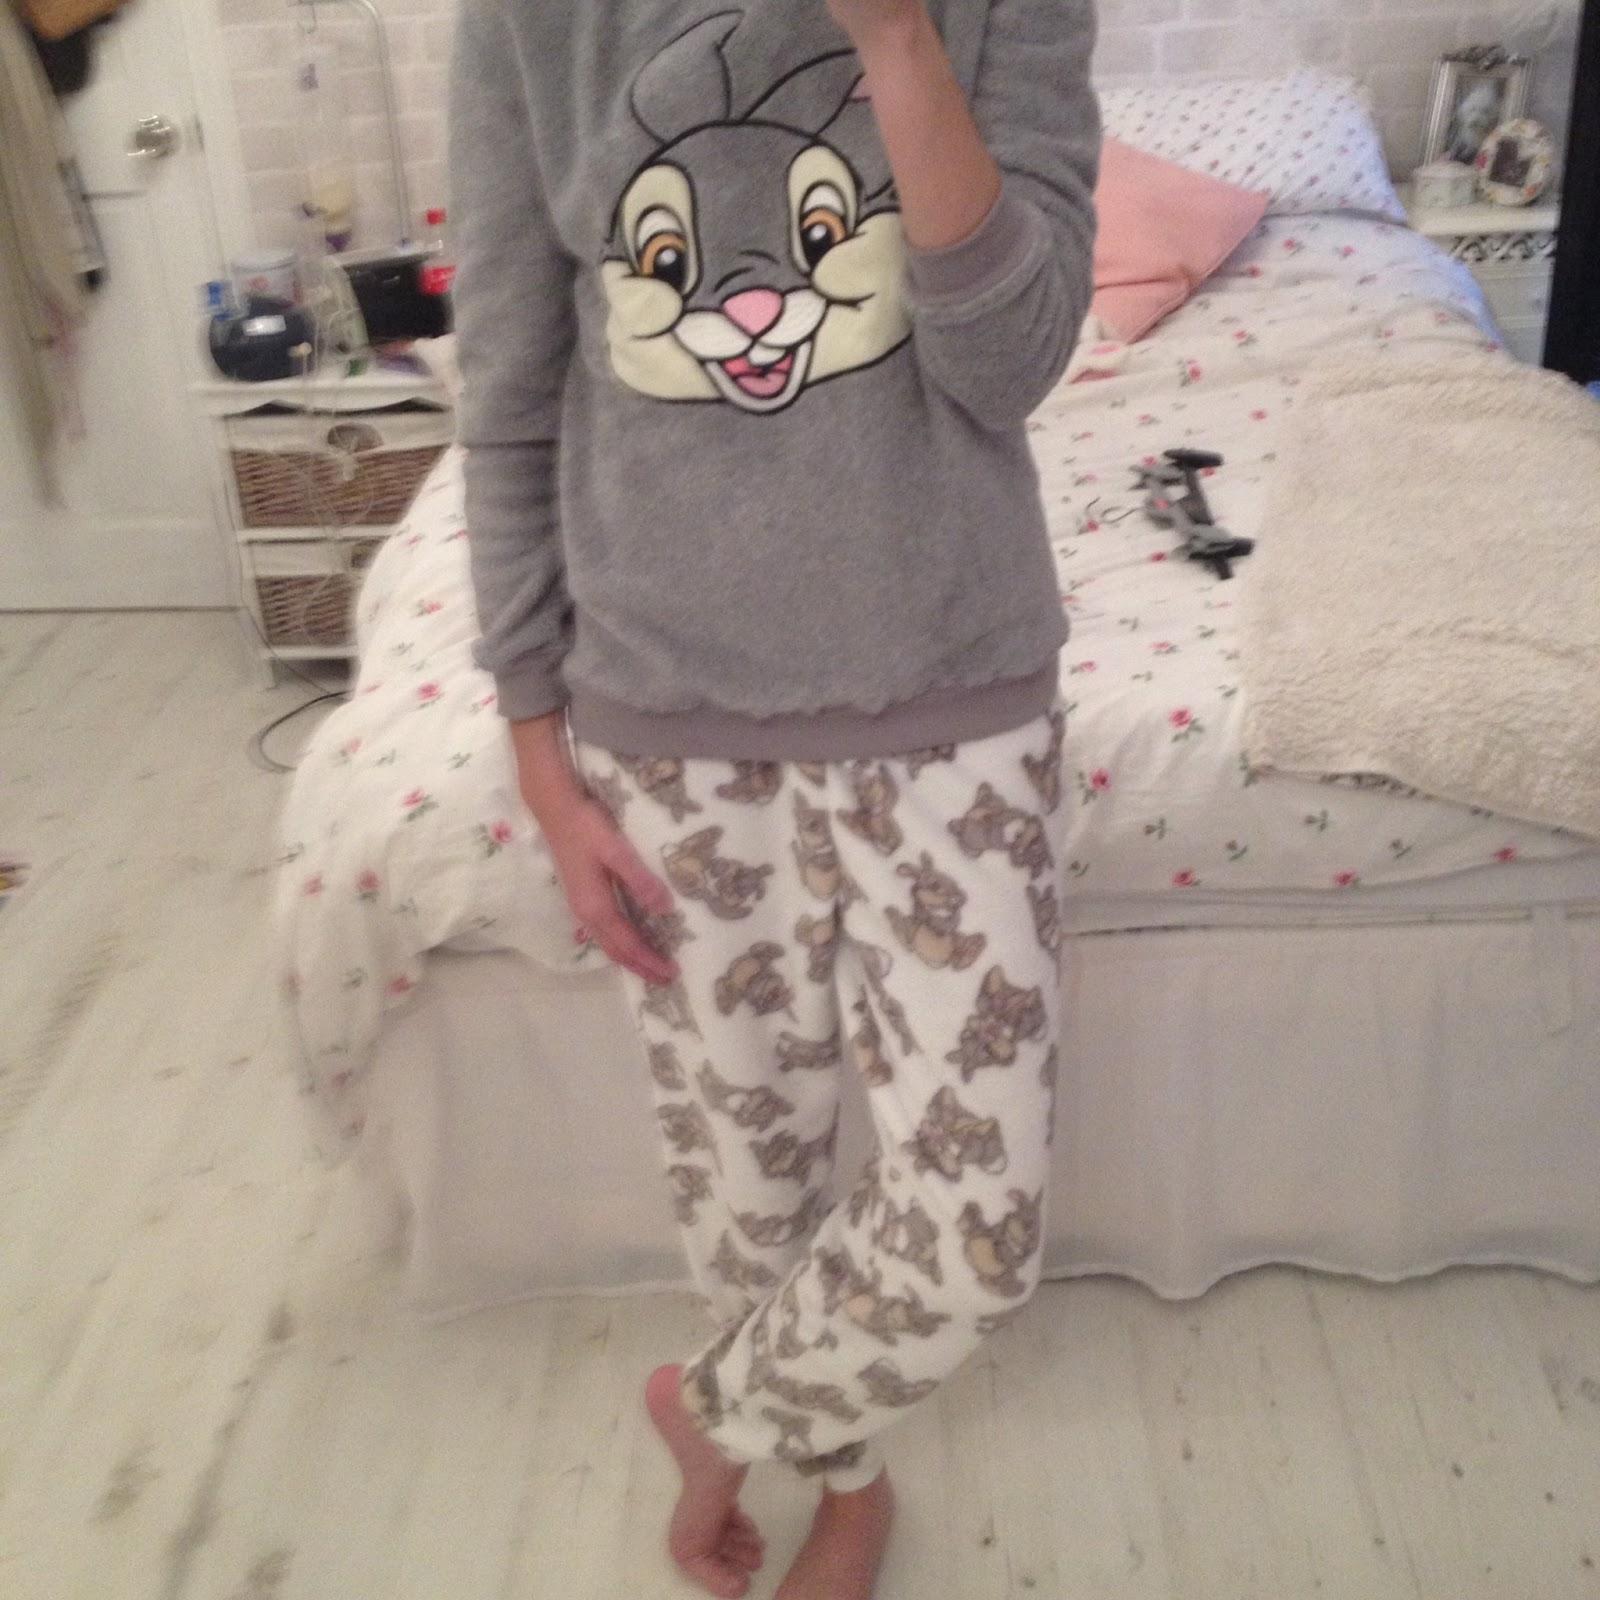 primark thumper bambi pyjamas